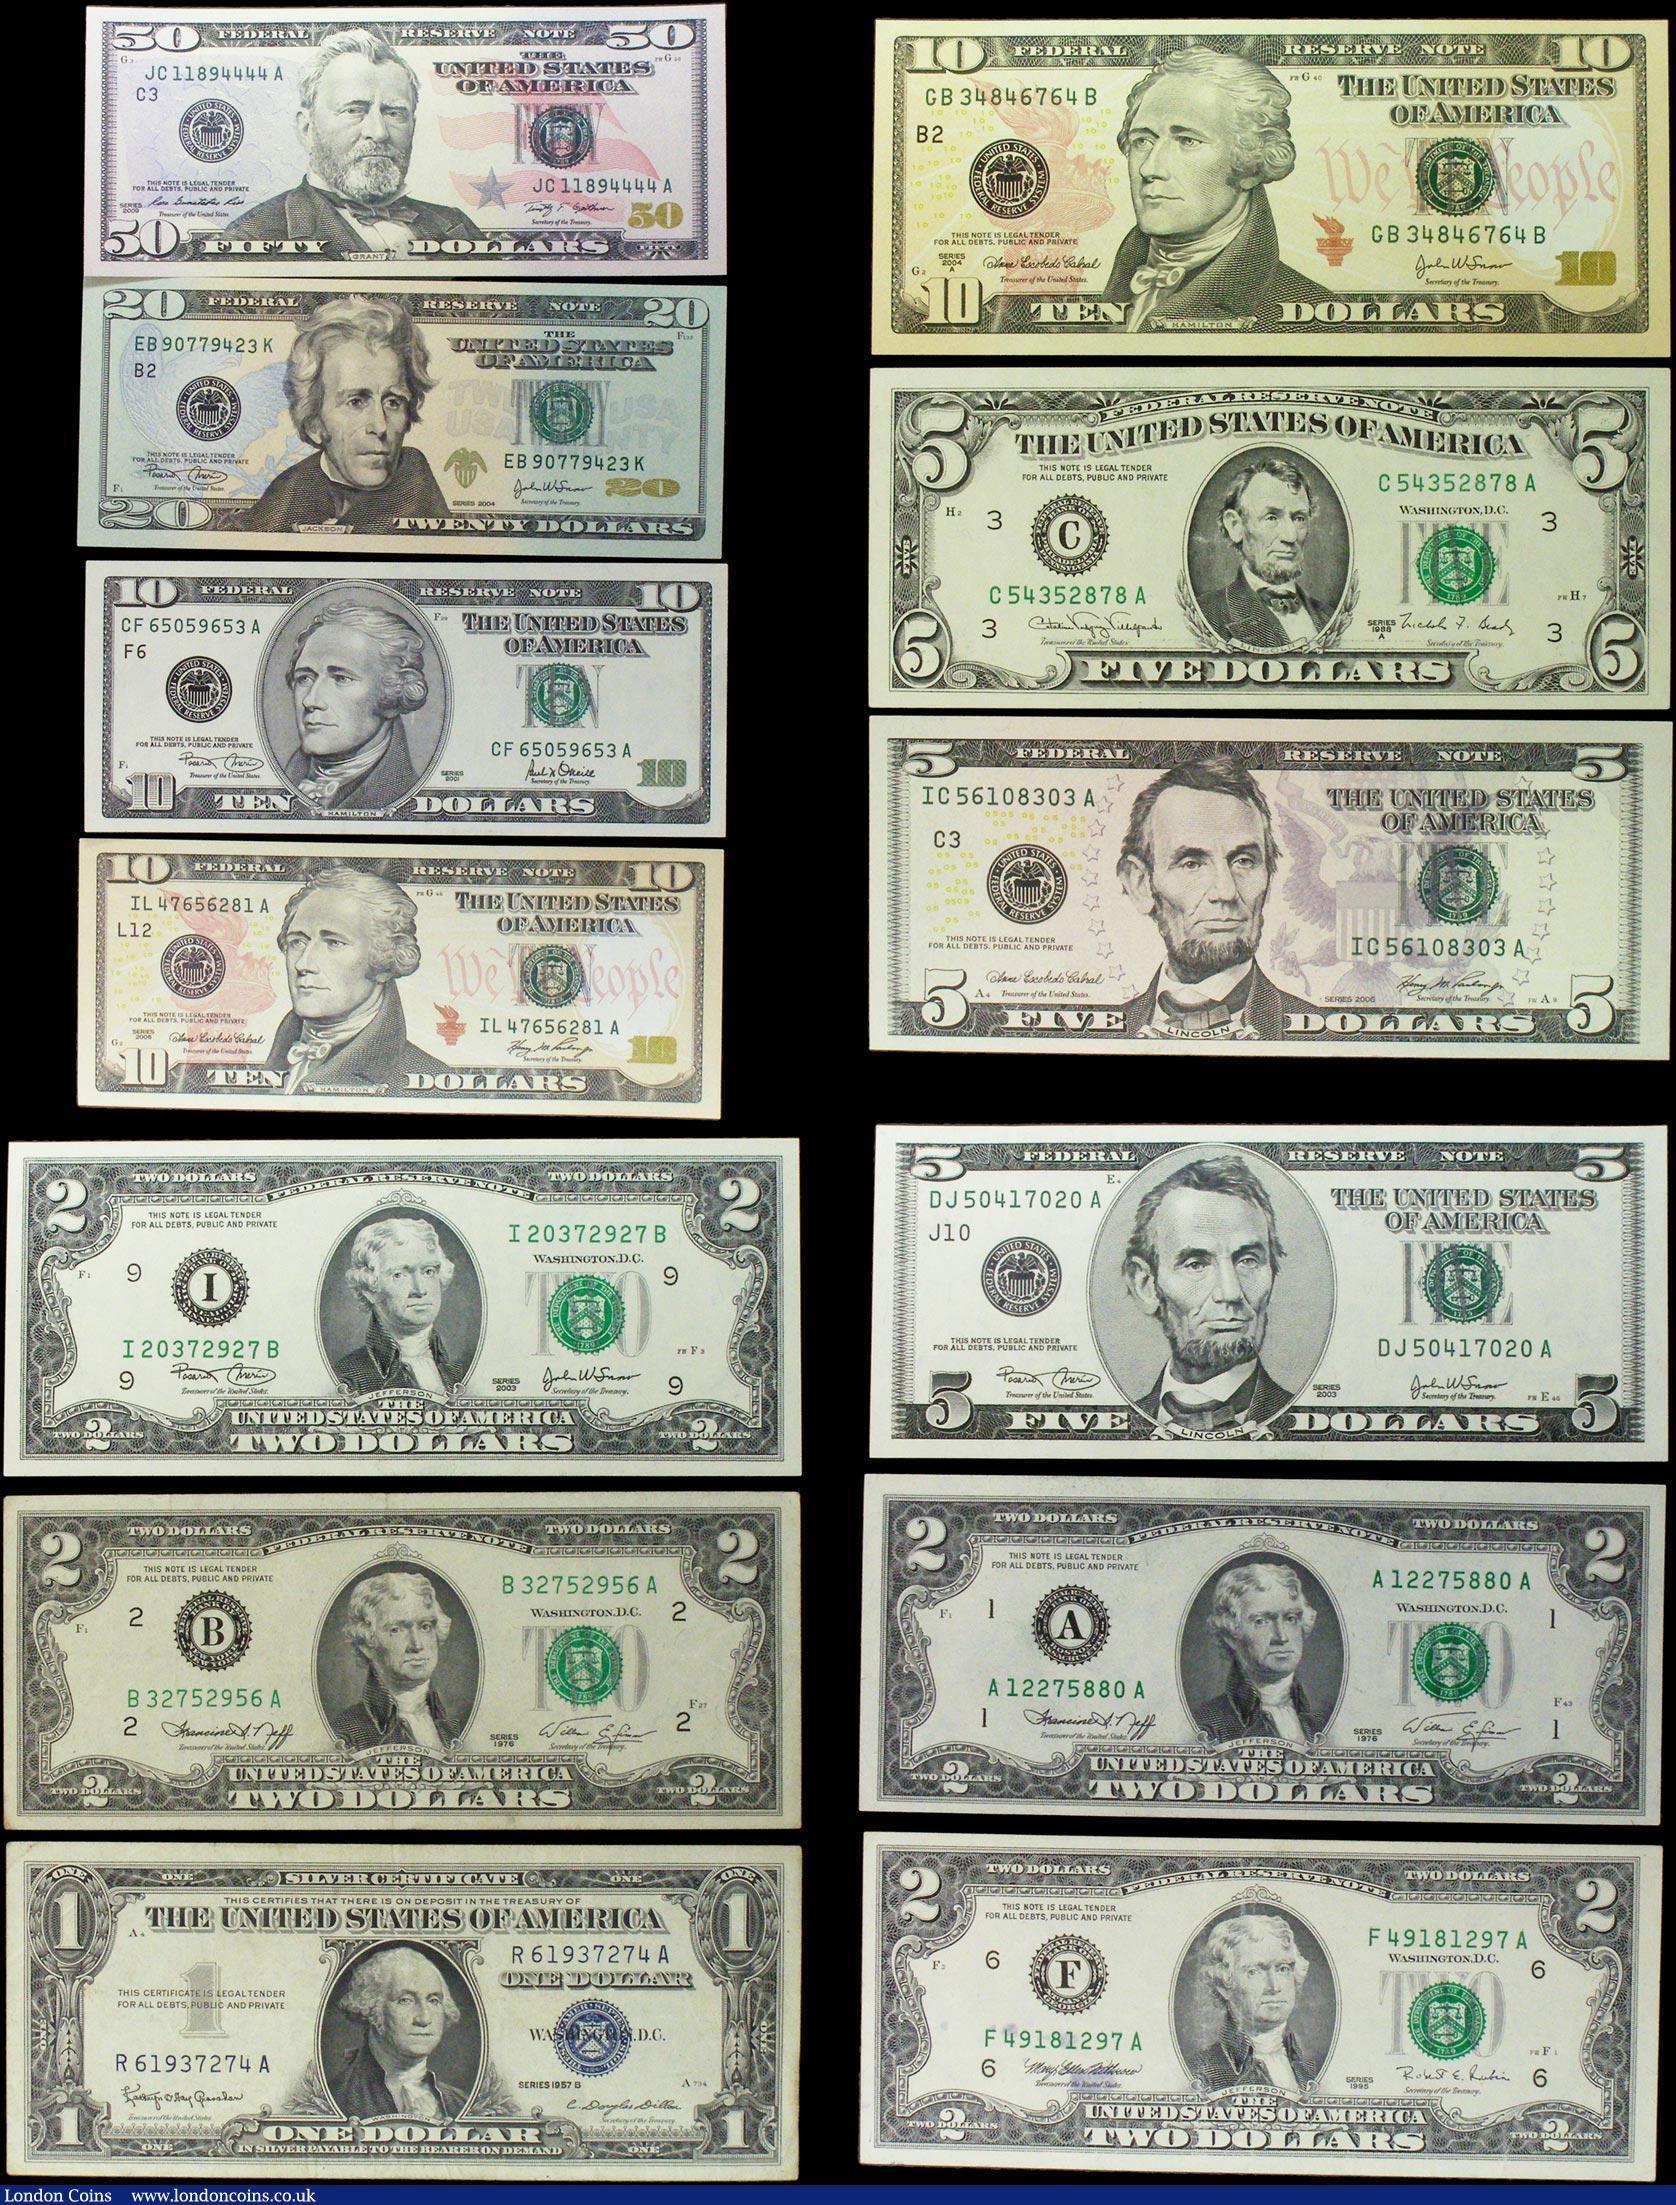 Usa Federal Reserve Note 13 50 Dollars 20 Dollars 10 Dollars 3